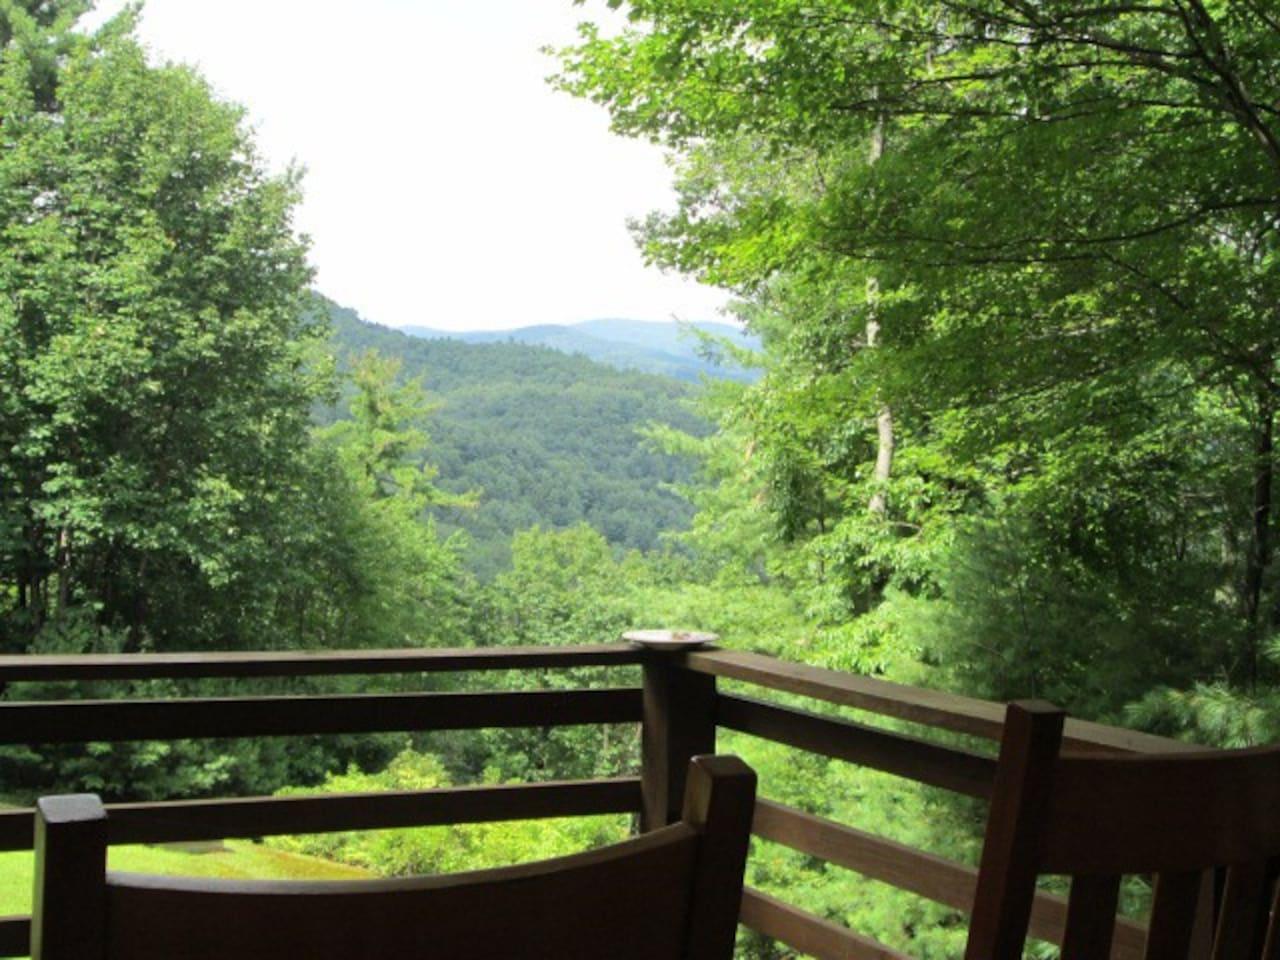 View of Appalachian Mountains